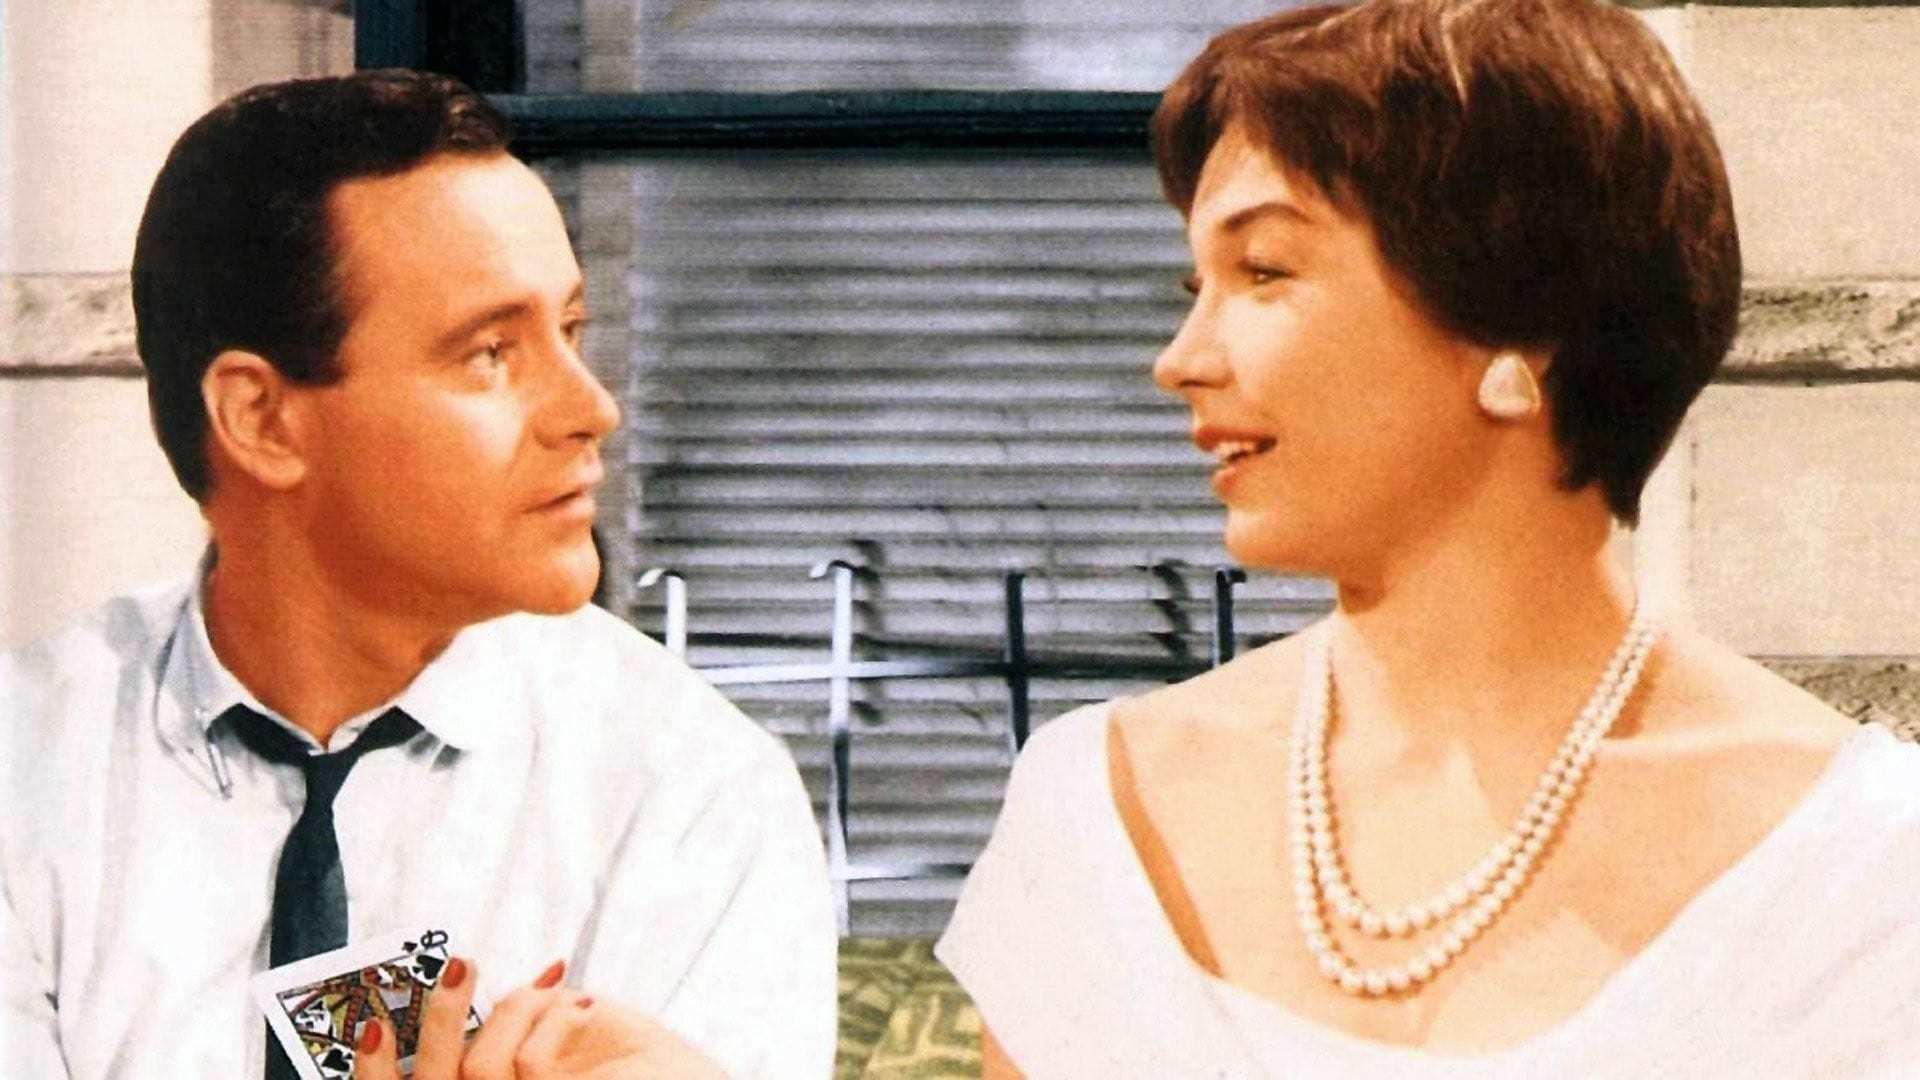 Кадры из фильма Квартира The Apartment 1960